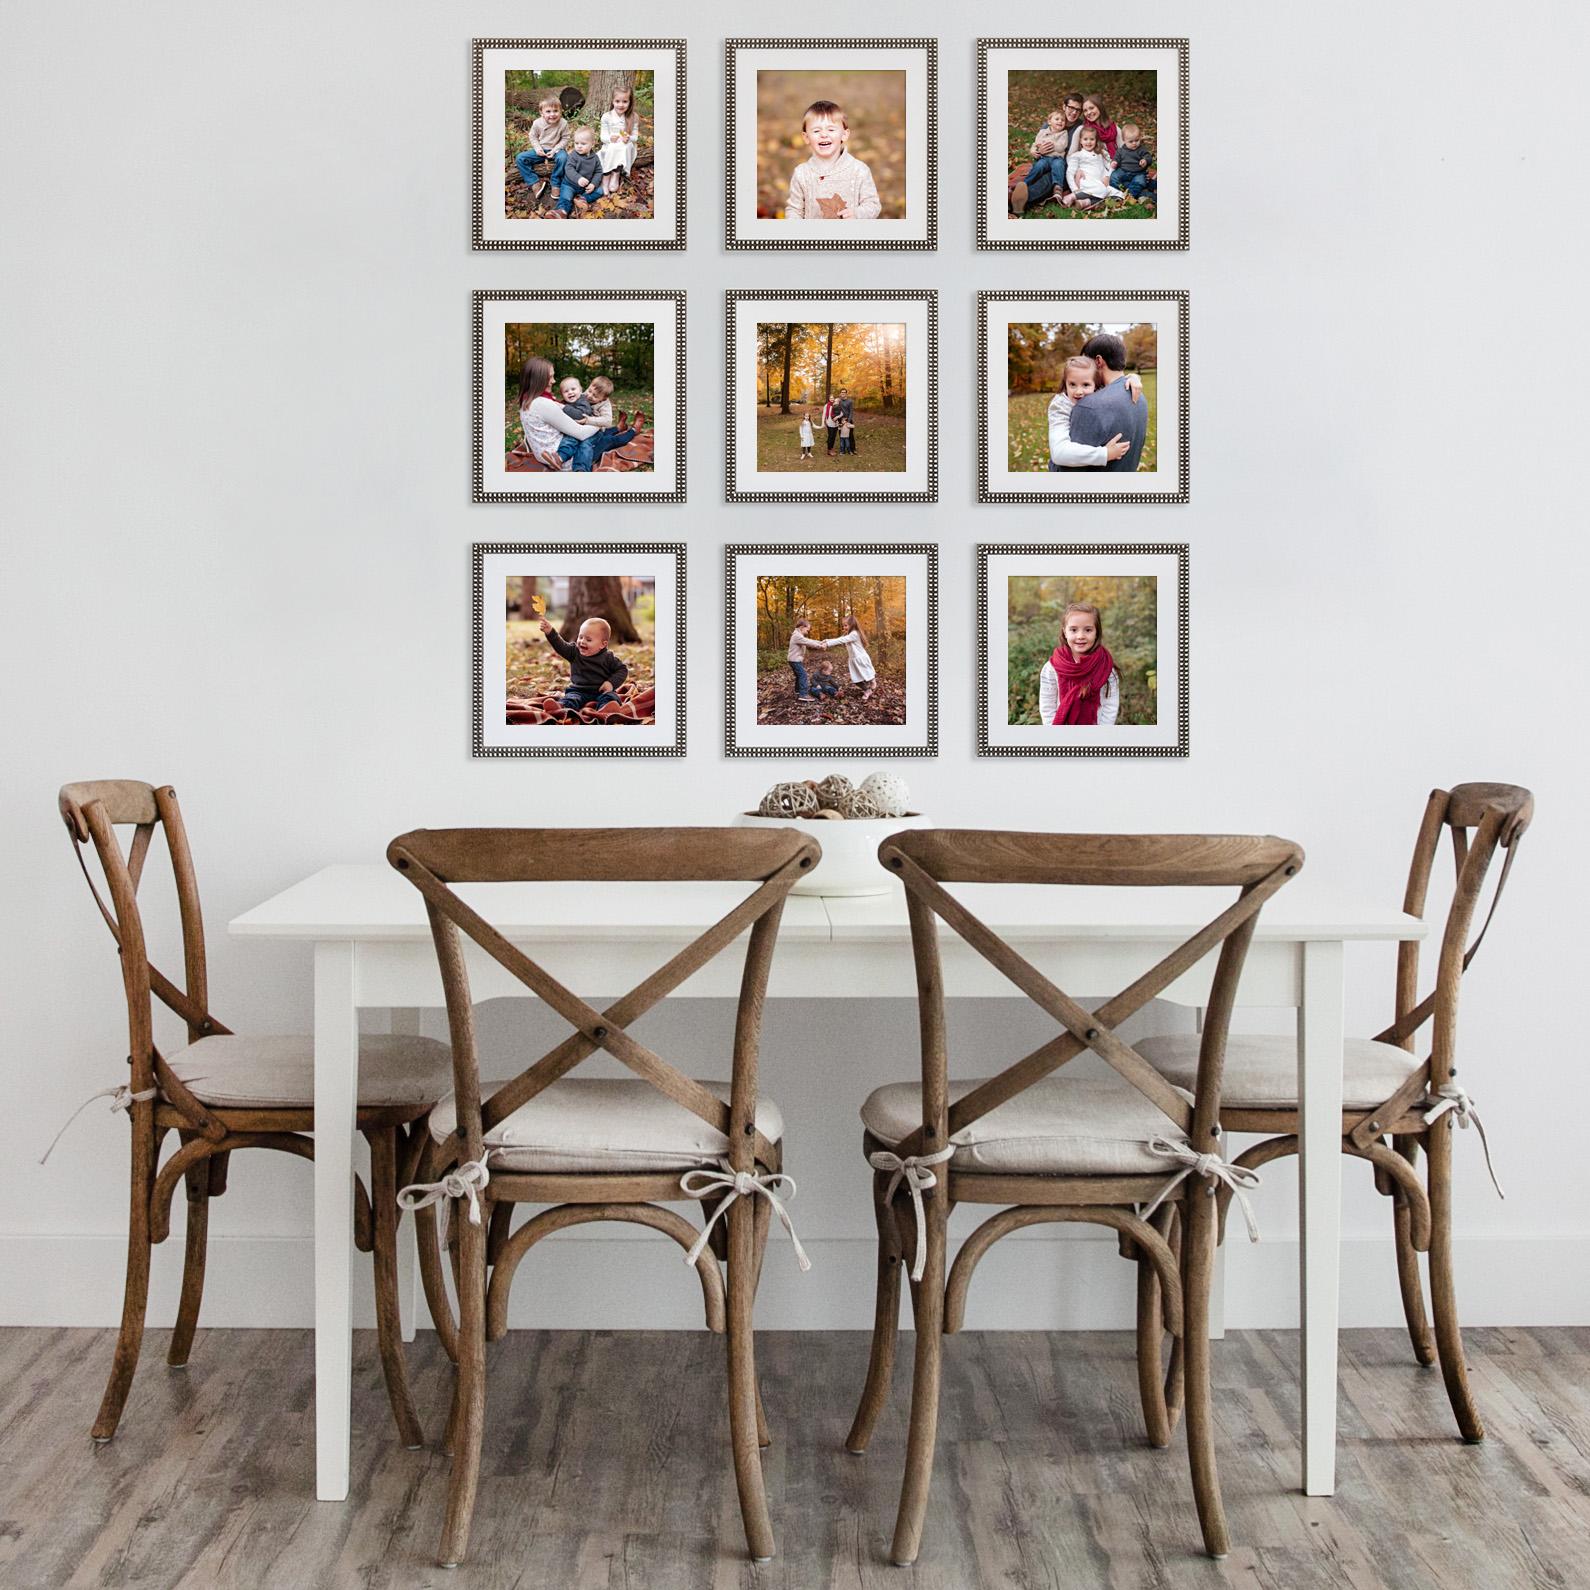 family-photo-gallery-wall.jpg